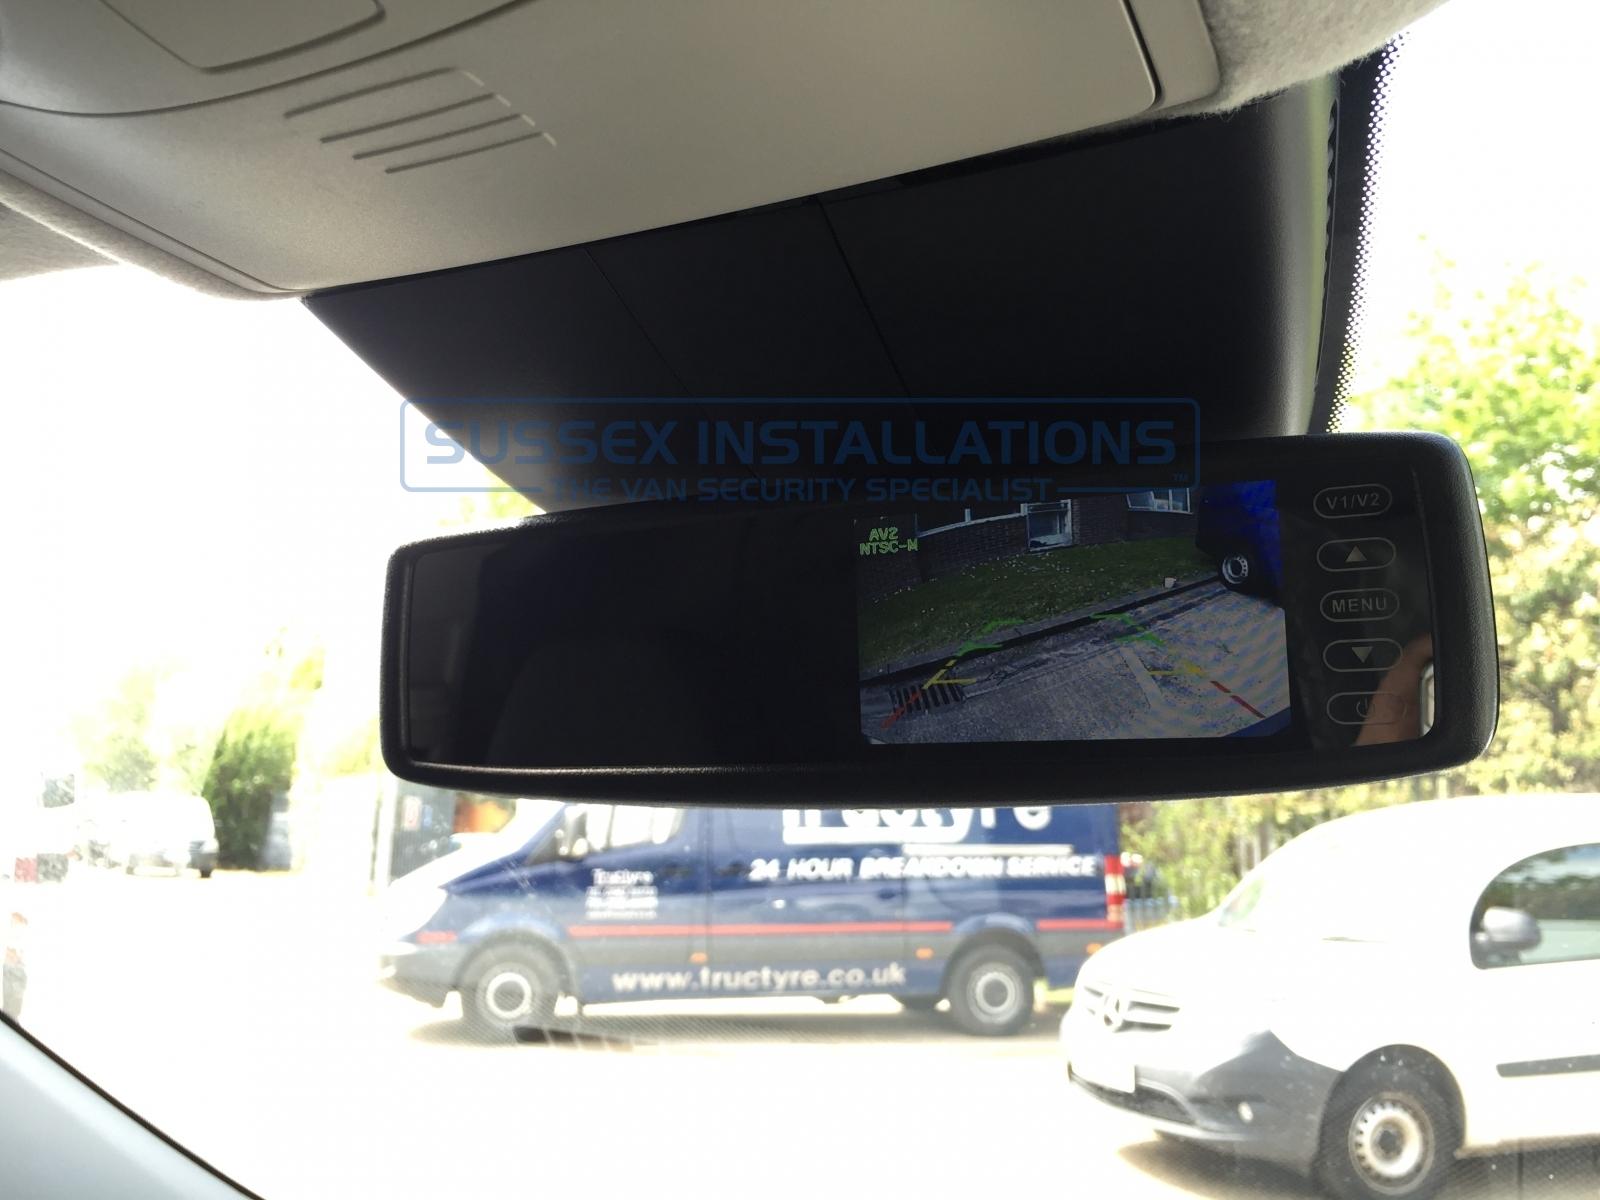 Gallery Mercedes Vito 2016 Reversing Camera Installation Backup Wiring Instructions Viano W447 2015 On